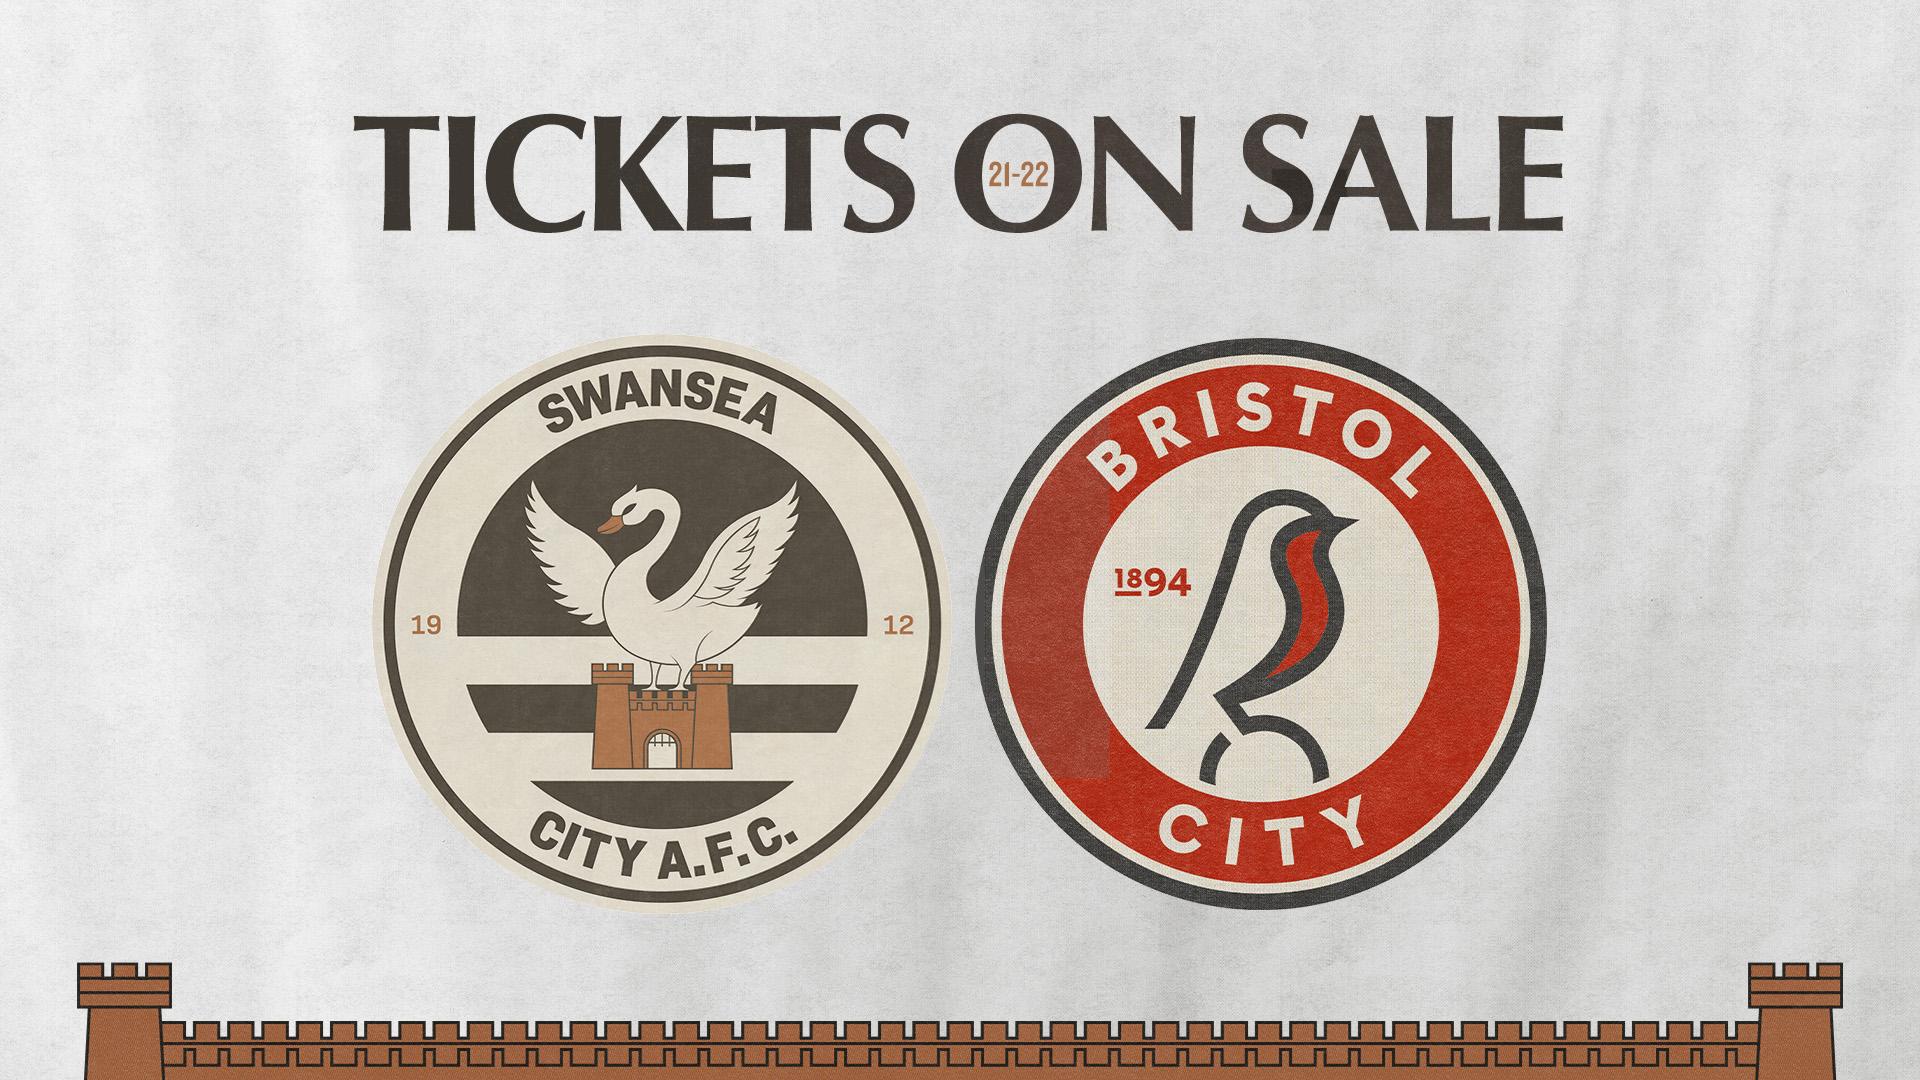 Bristol City away tickets